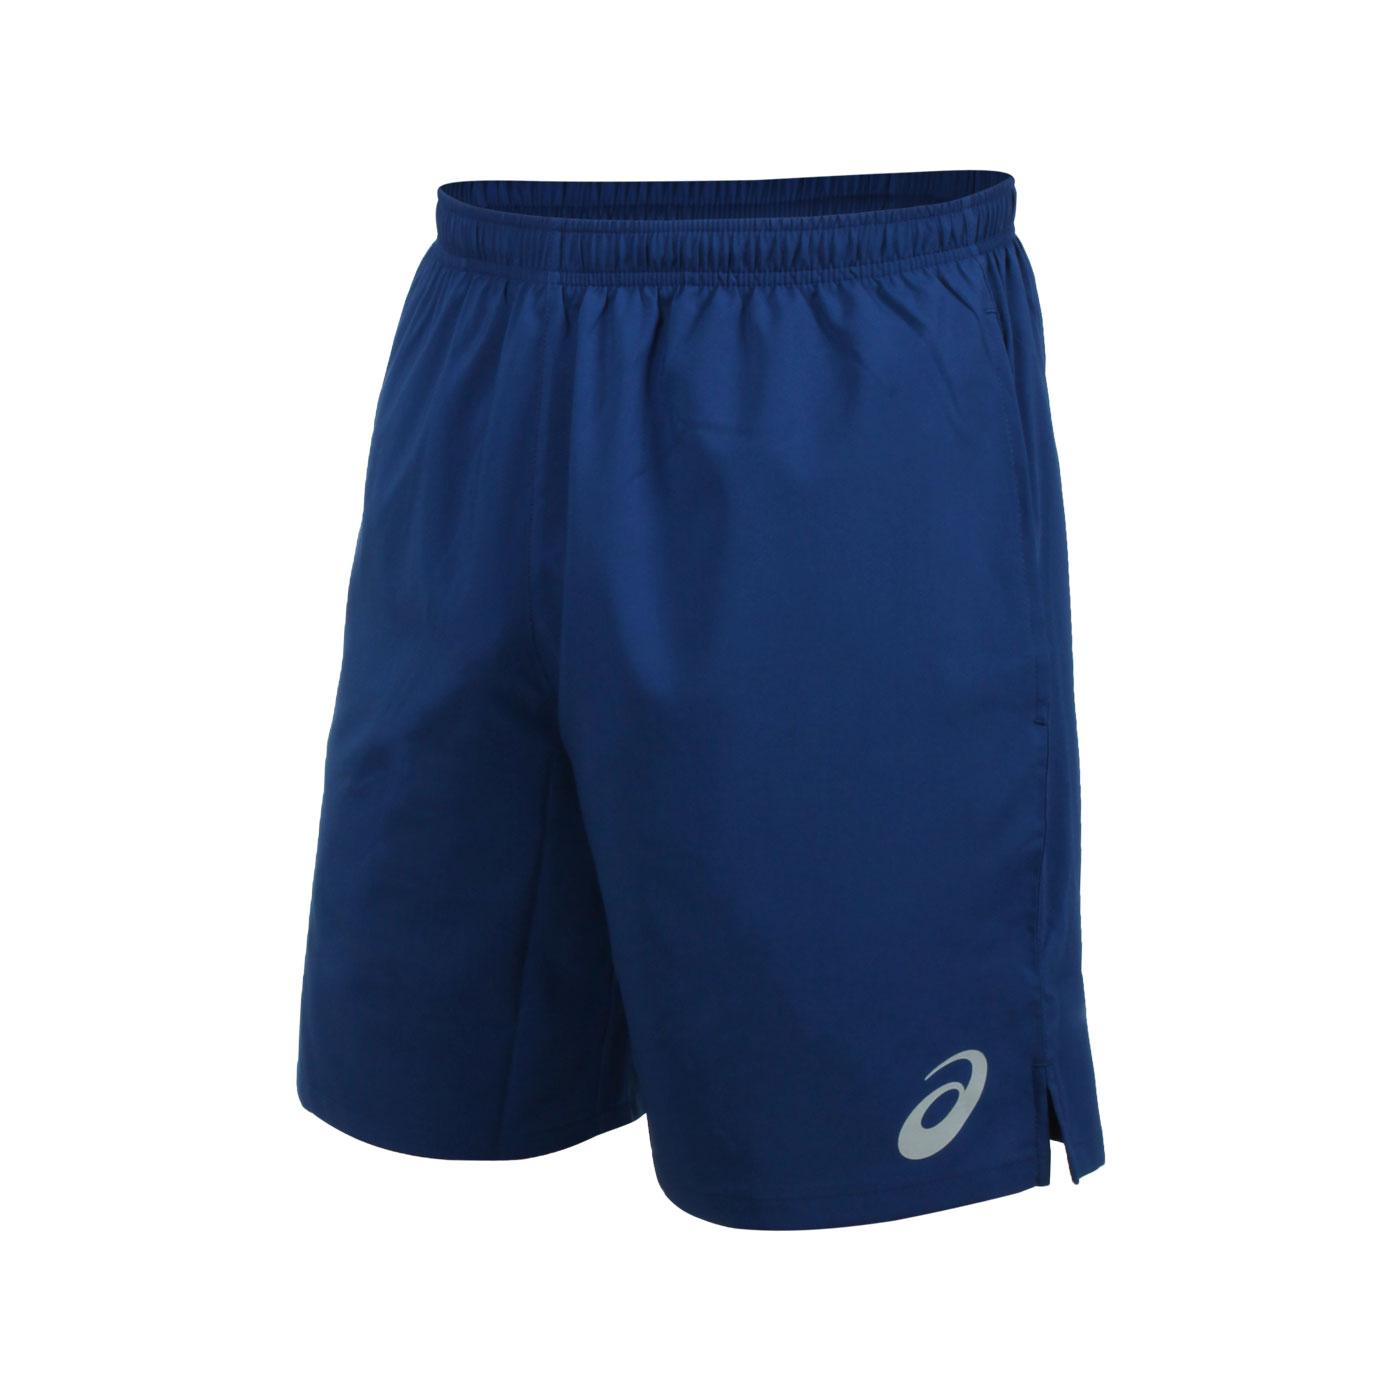 ASICS 男款平織短褲 2033B130-401 - 藍銀